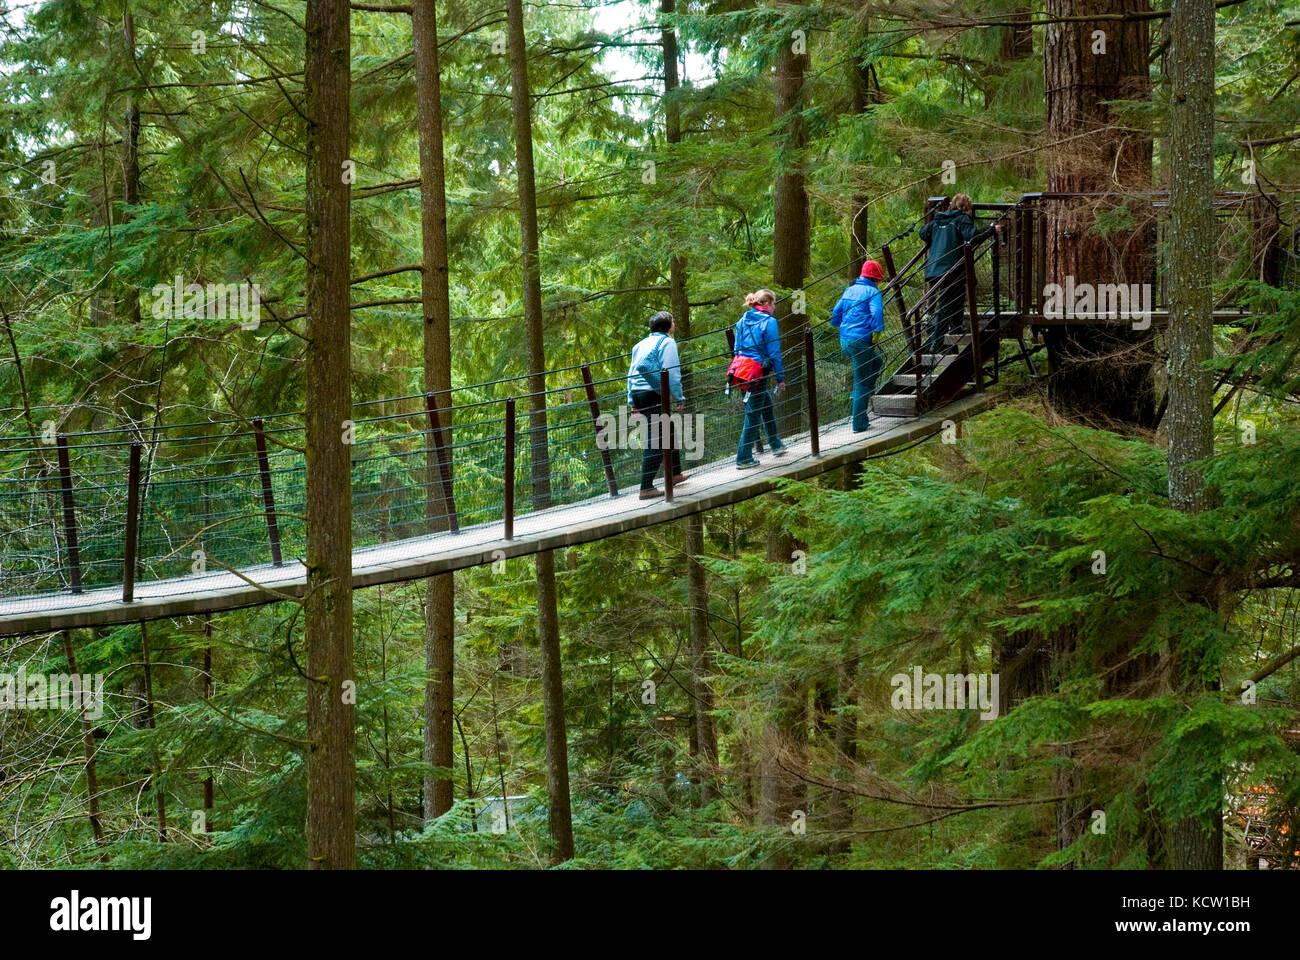 Treetops Adventure in der capilano Park, Vancouver, British Columbia, Kanada Stockbild